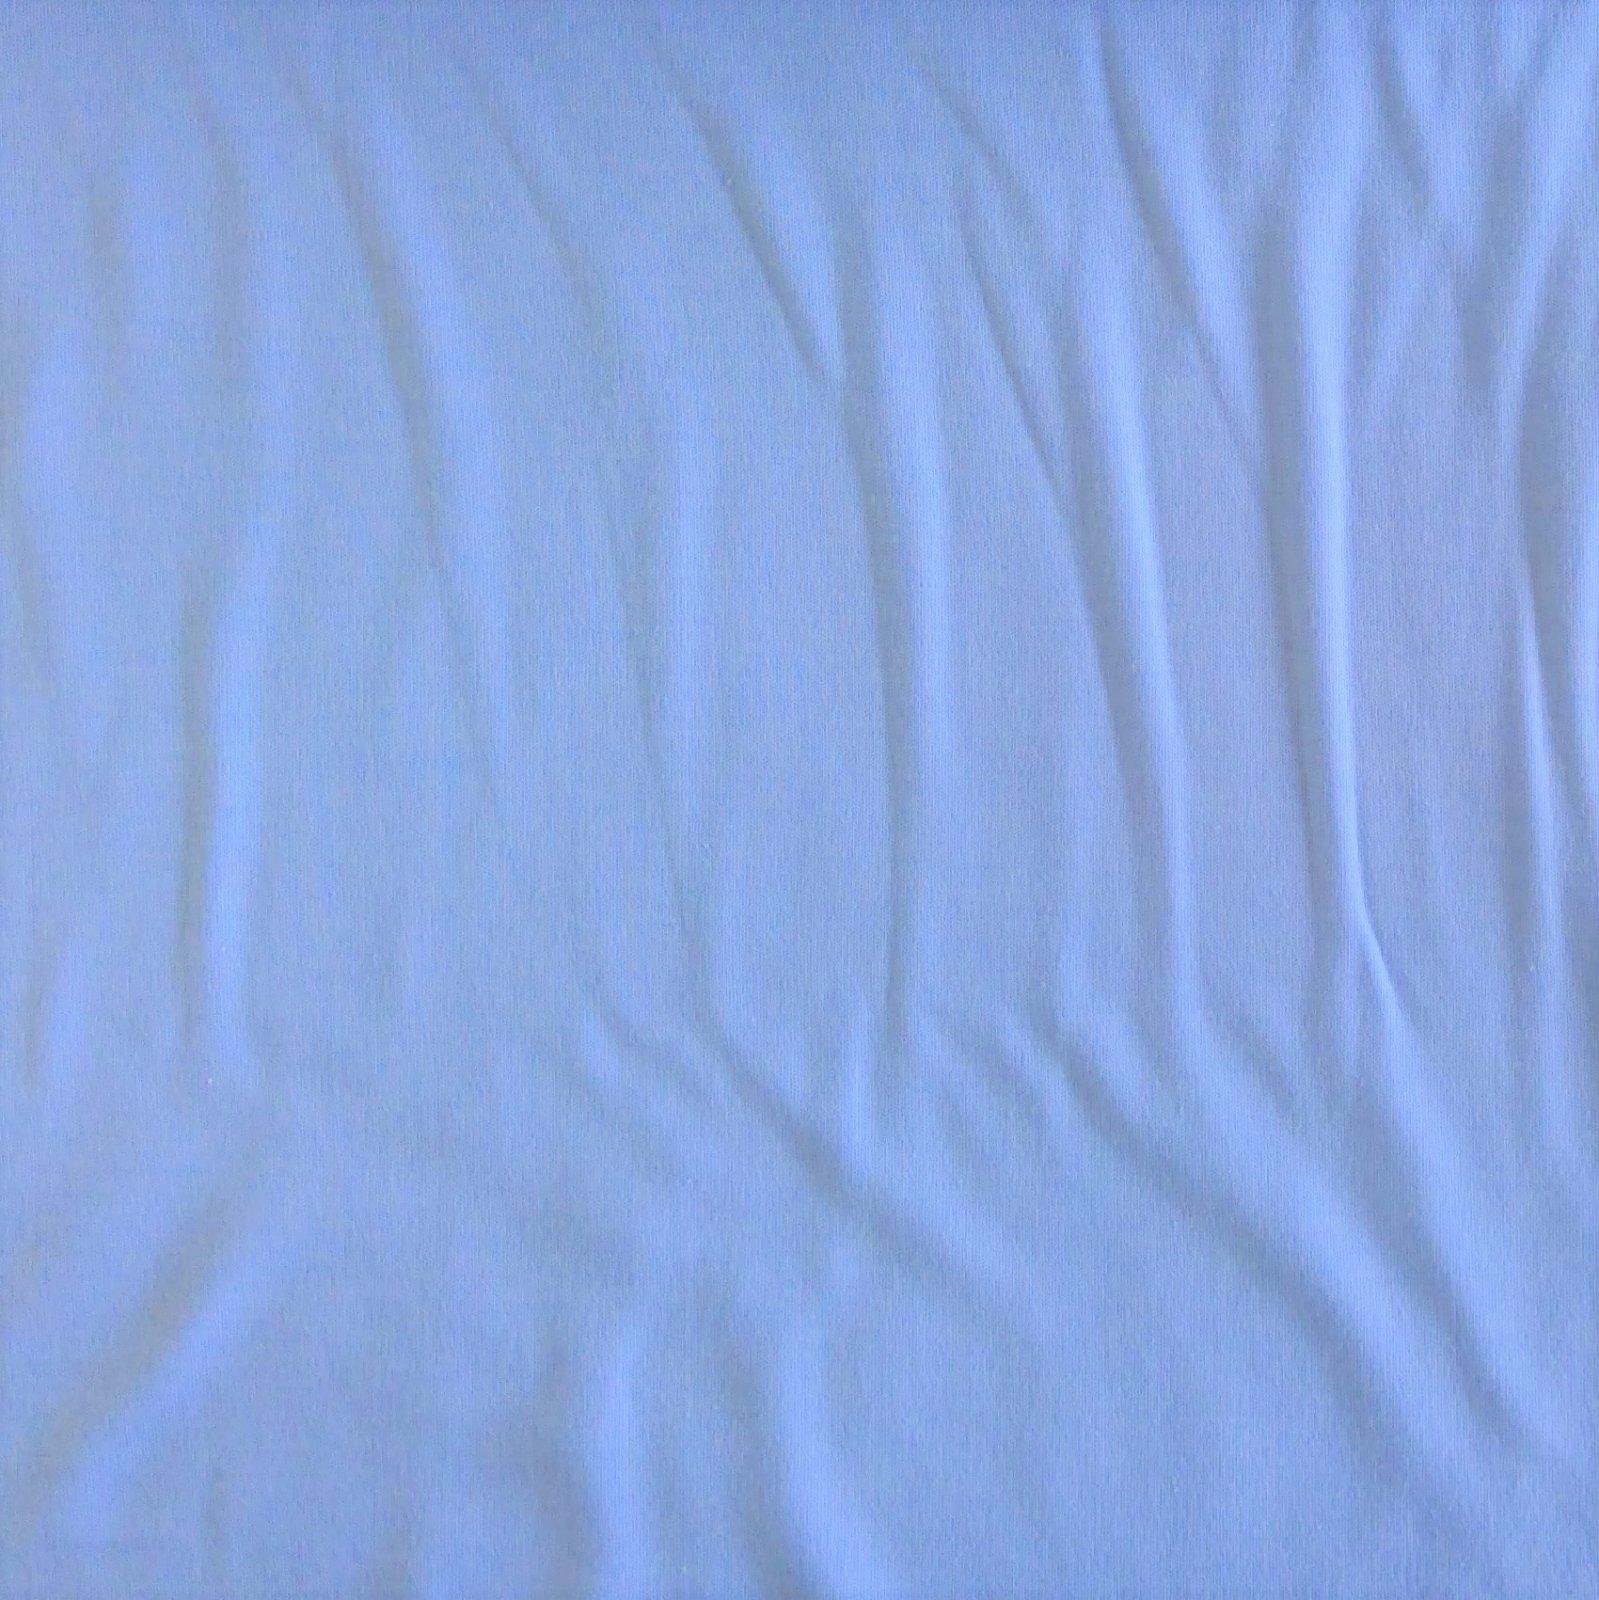 T-Shirt Interlock Cotton Blend Bare Knits Blue